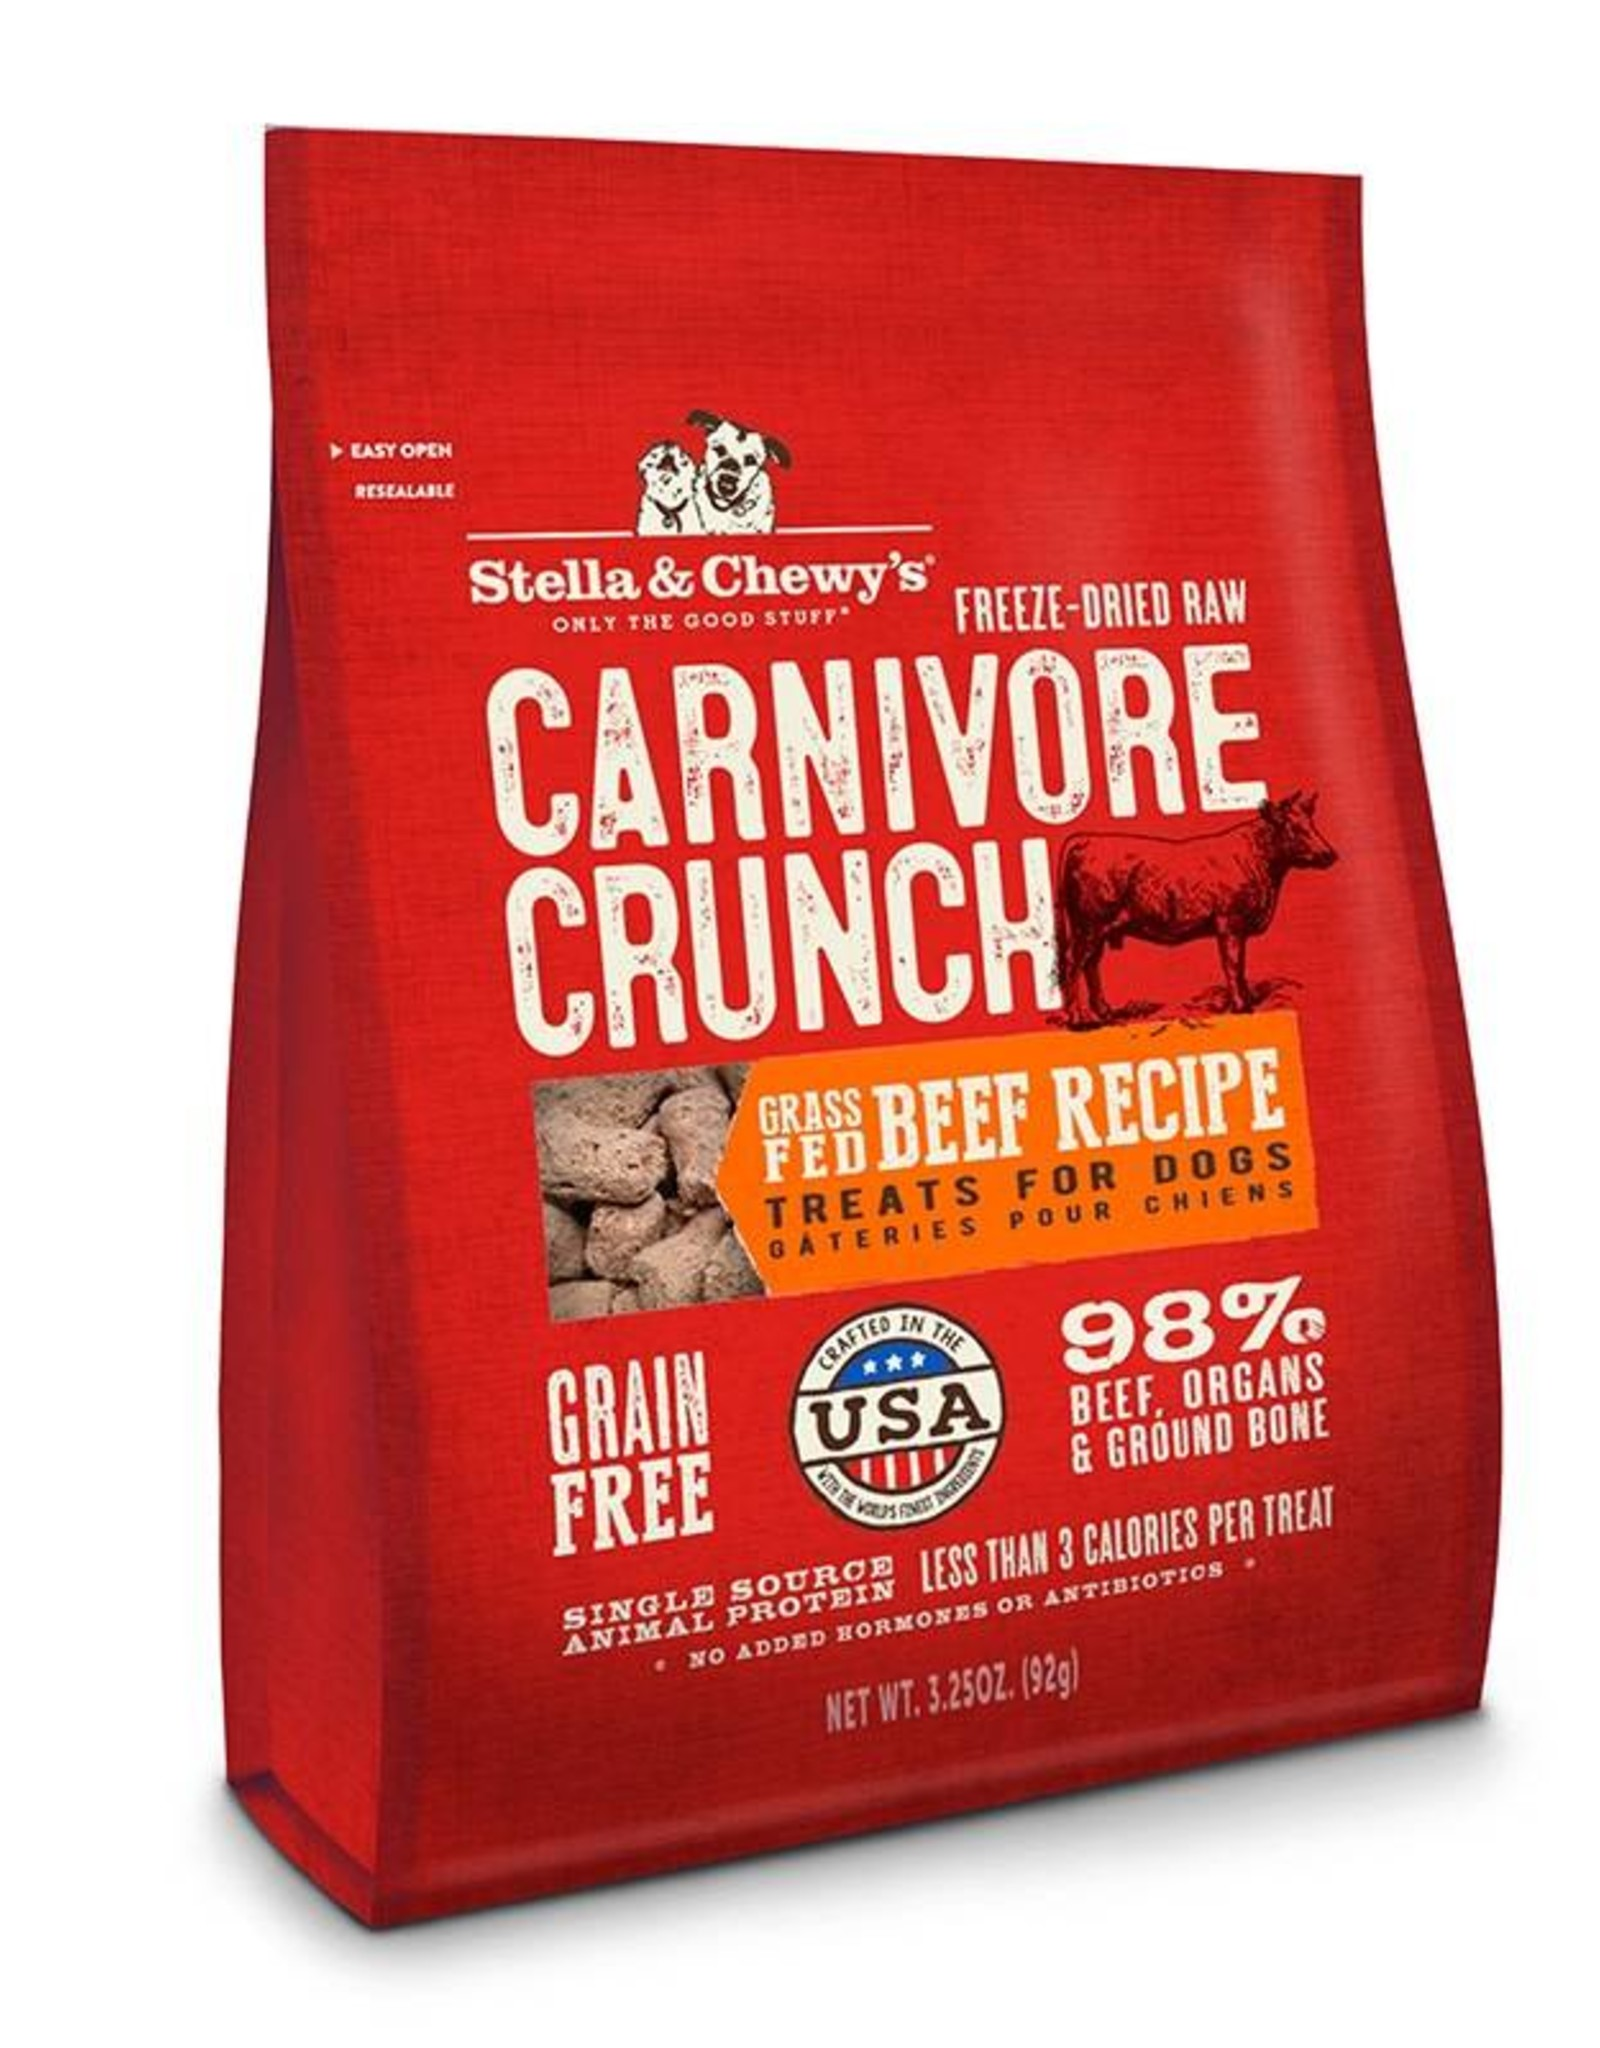 Stella & Chewy's Stella & Chewy's Carnivore Crunch Grass-Fed Beef Recipe Dog Treat- 3.25 oz. bag